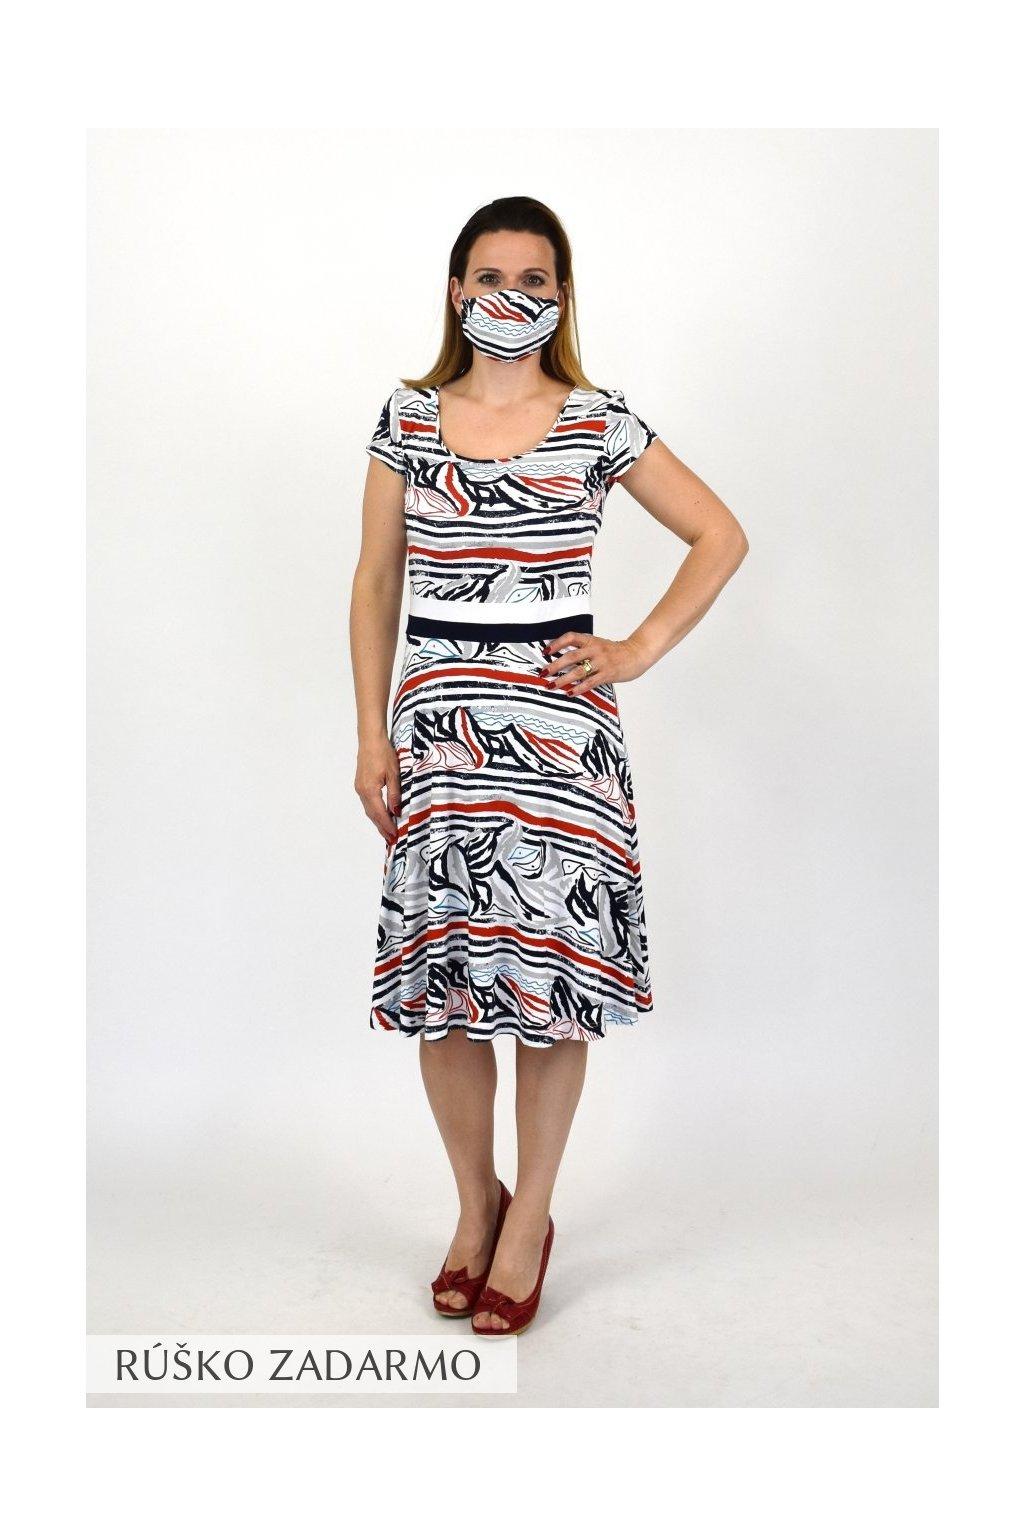 dámska móda leto favab